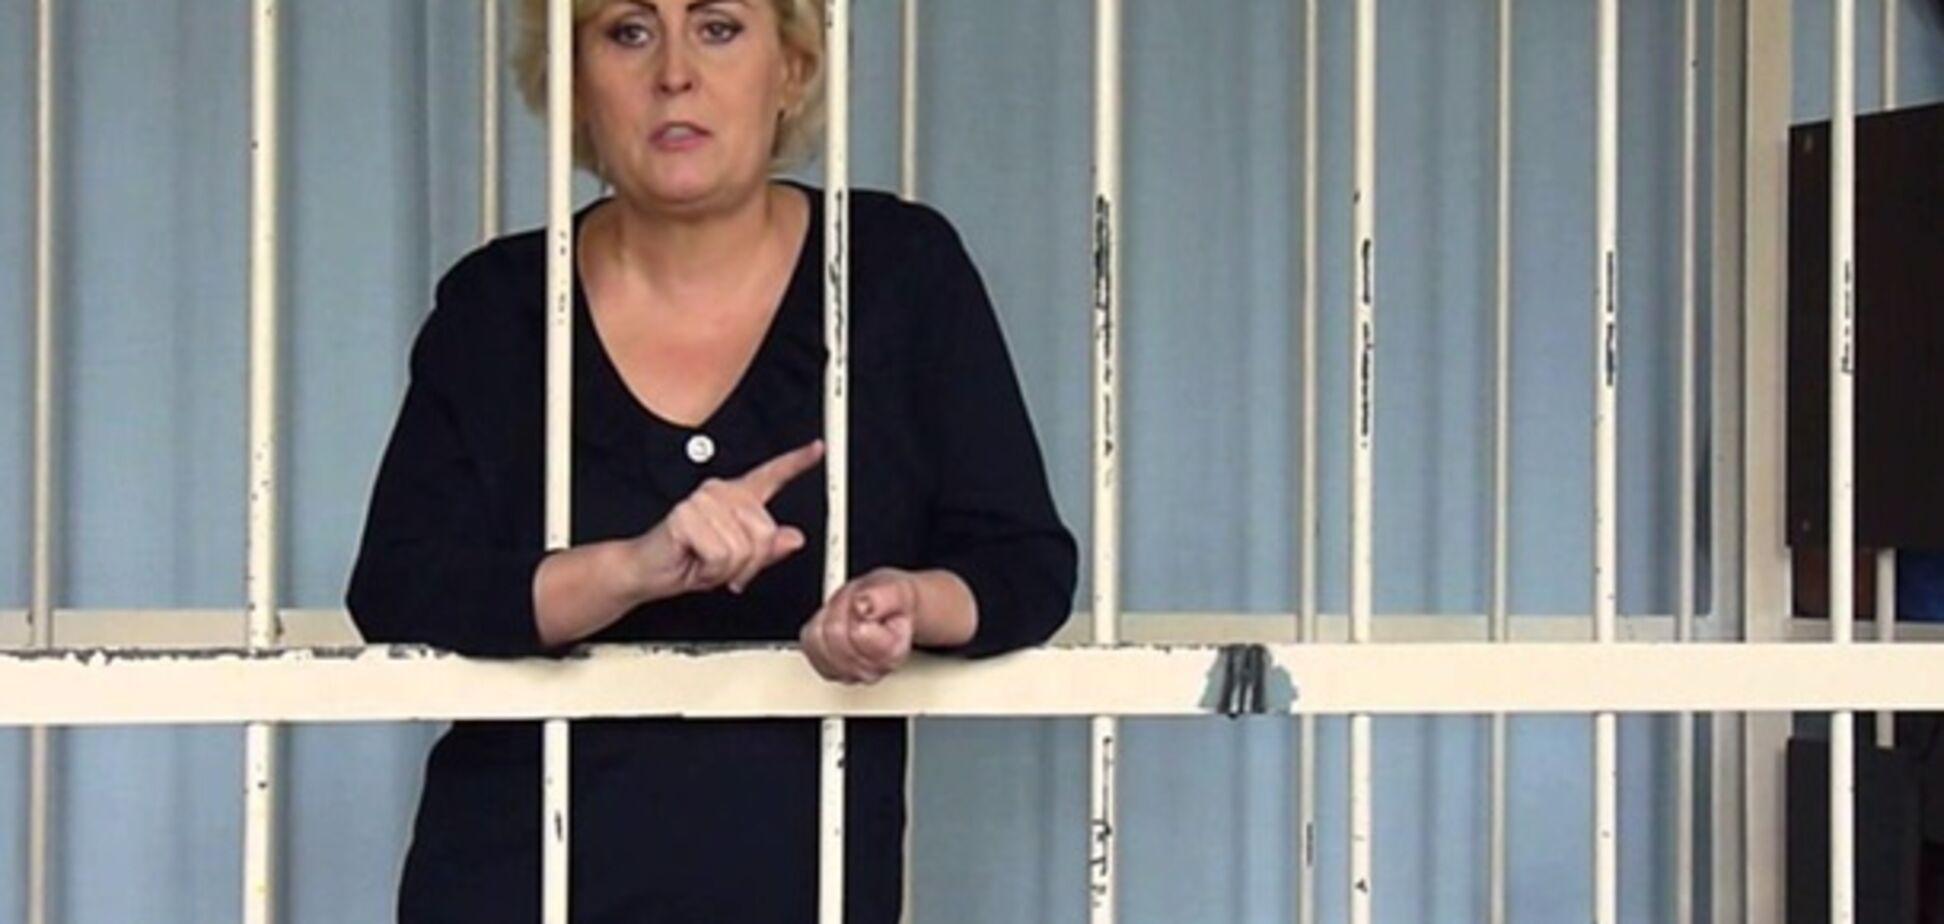 Одиозную сепаратистку выпустили из СИЗО под крики 'Слава Украине!': опубликовано видео